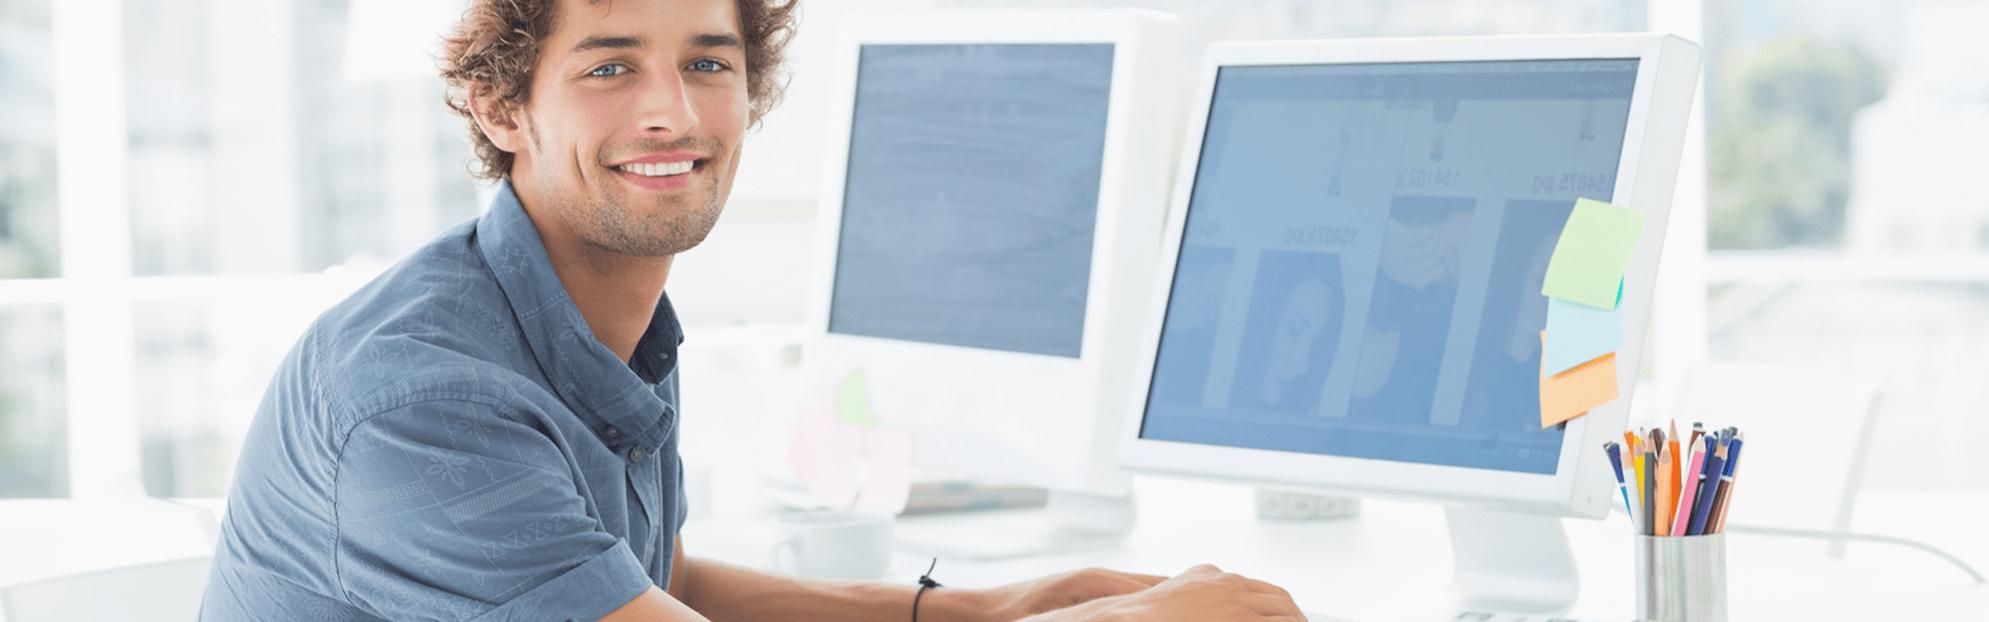 Webdesigner-weert